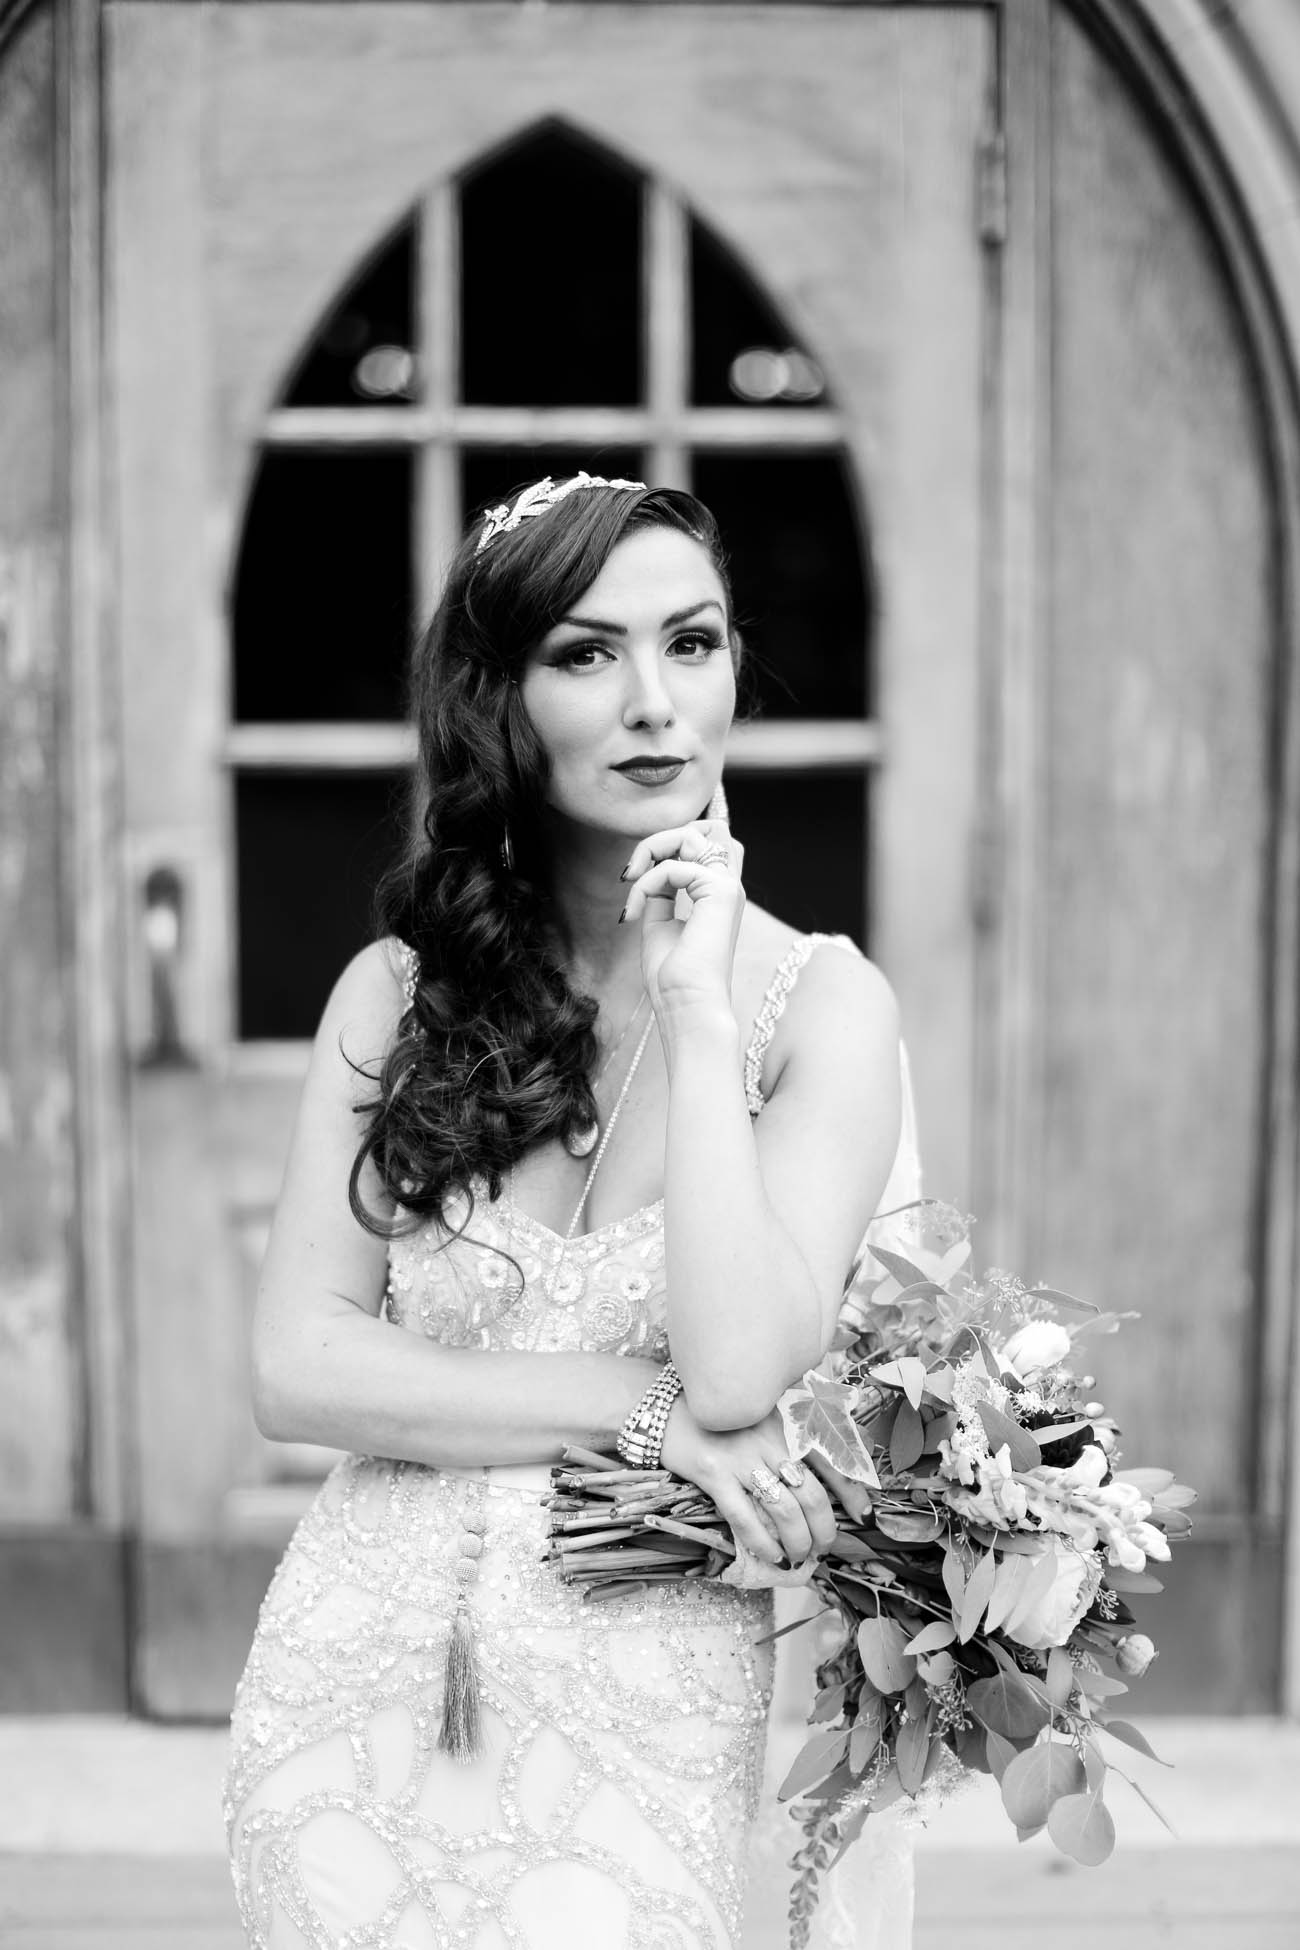 Speakeasy-1920s-theme-Louisville-and-Lexington Wedding-335.jpg